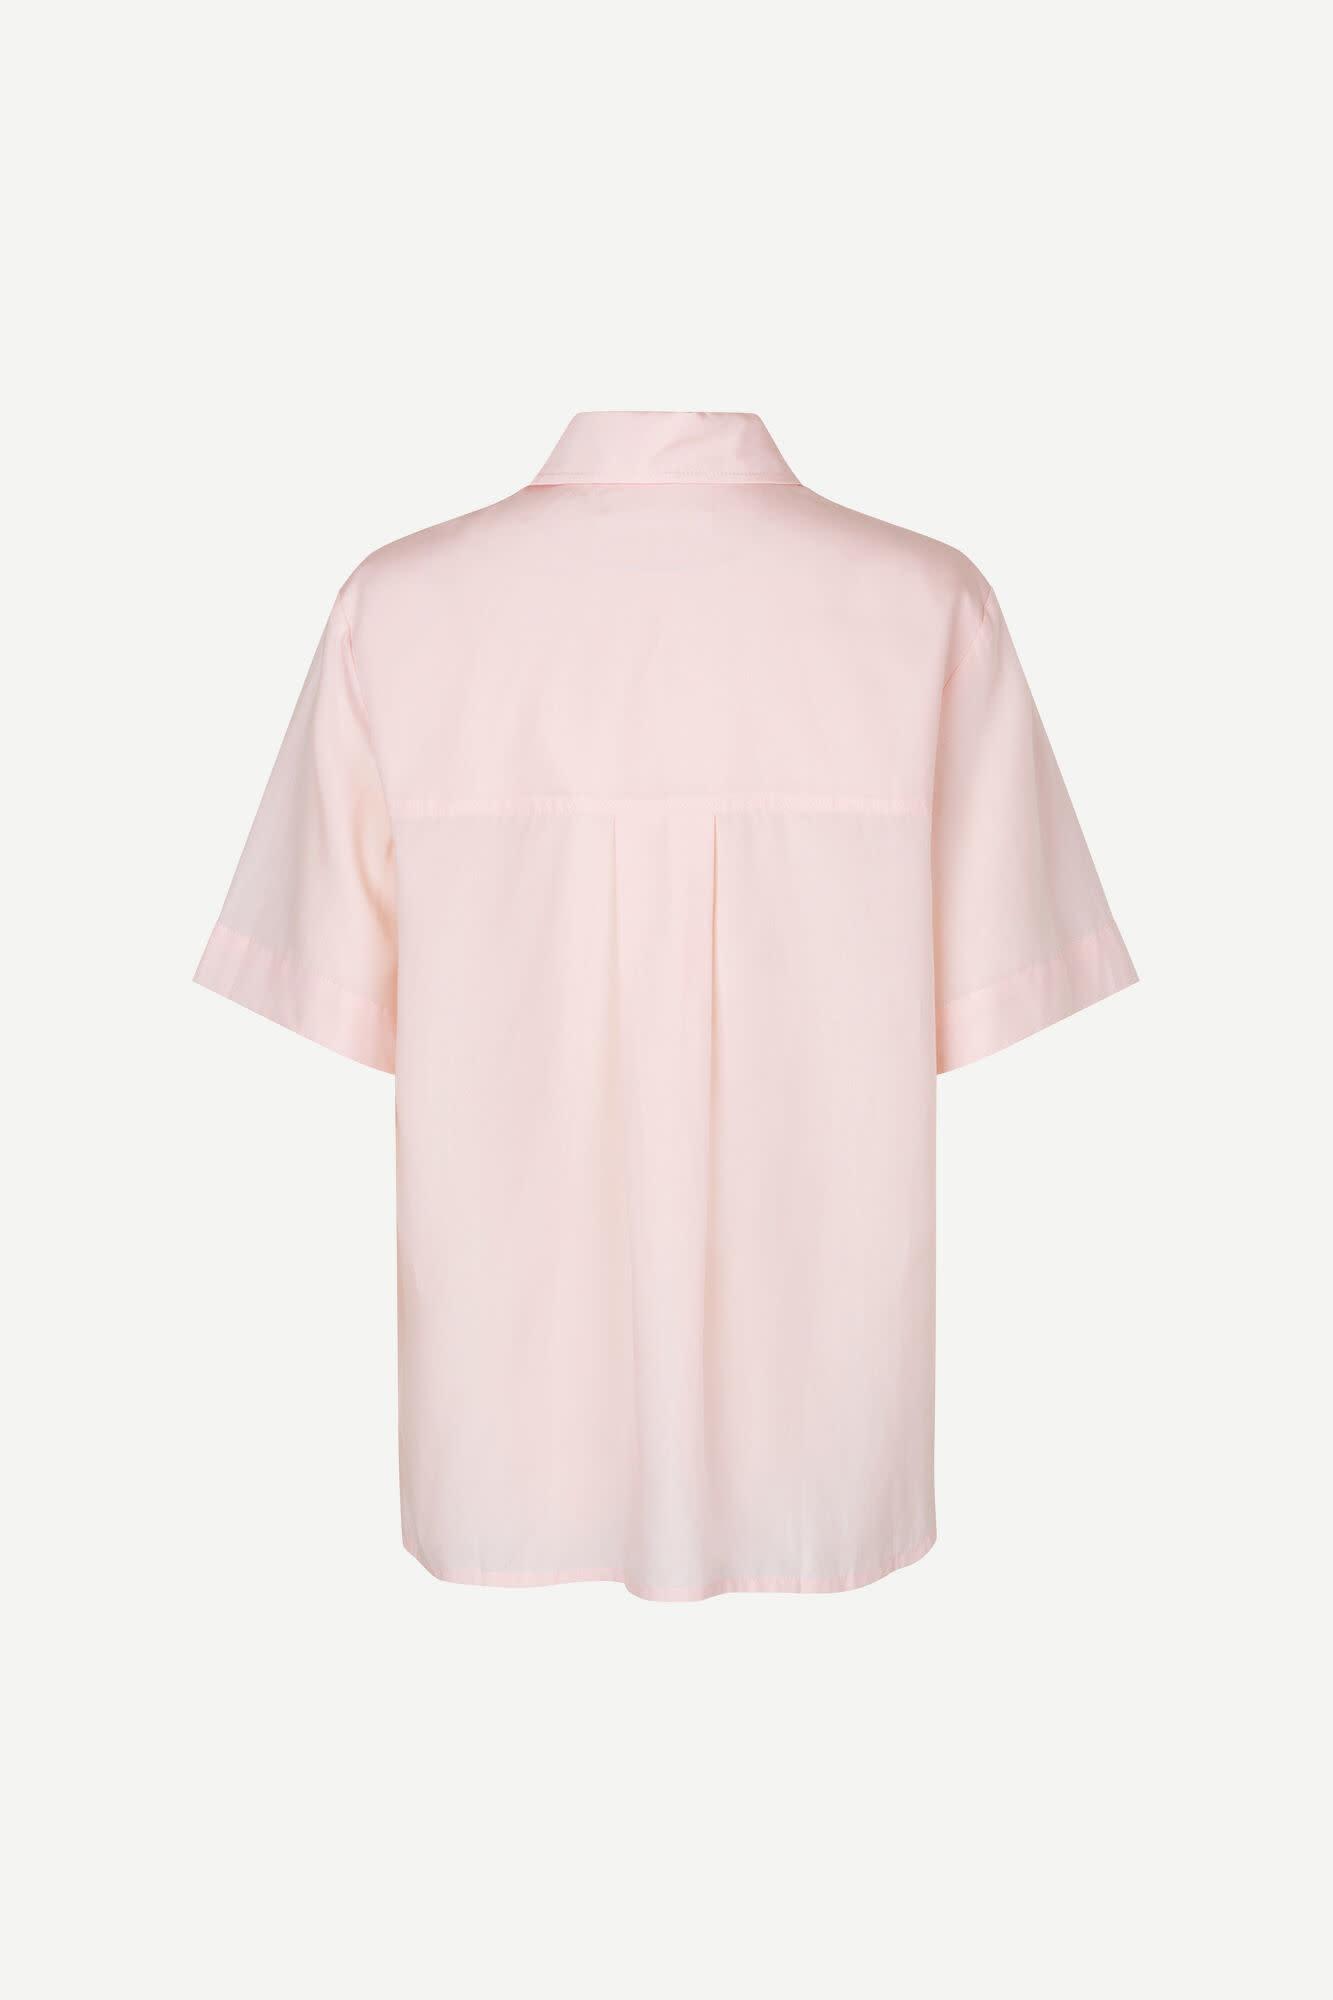 Overhemd met korte mouwen Bansa Crystal Pink 10554-2